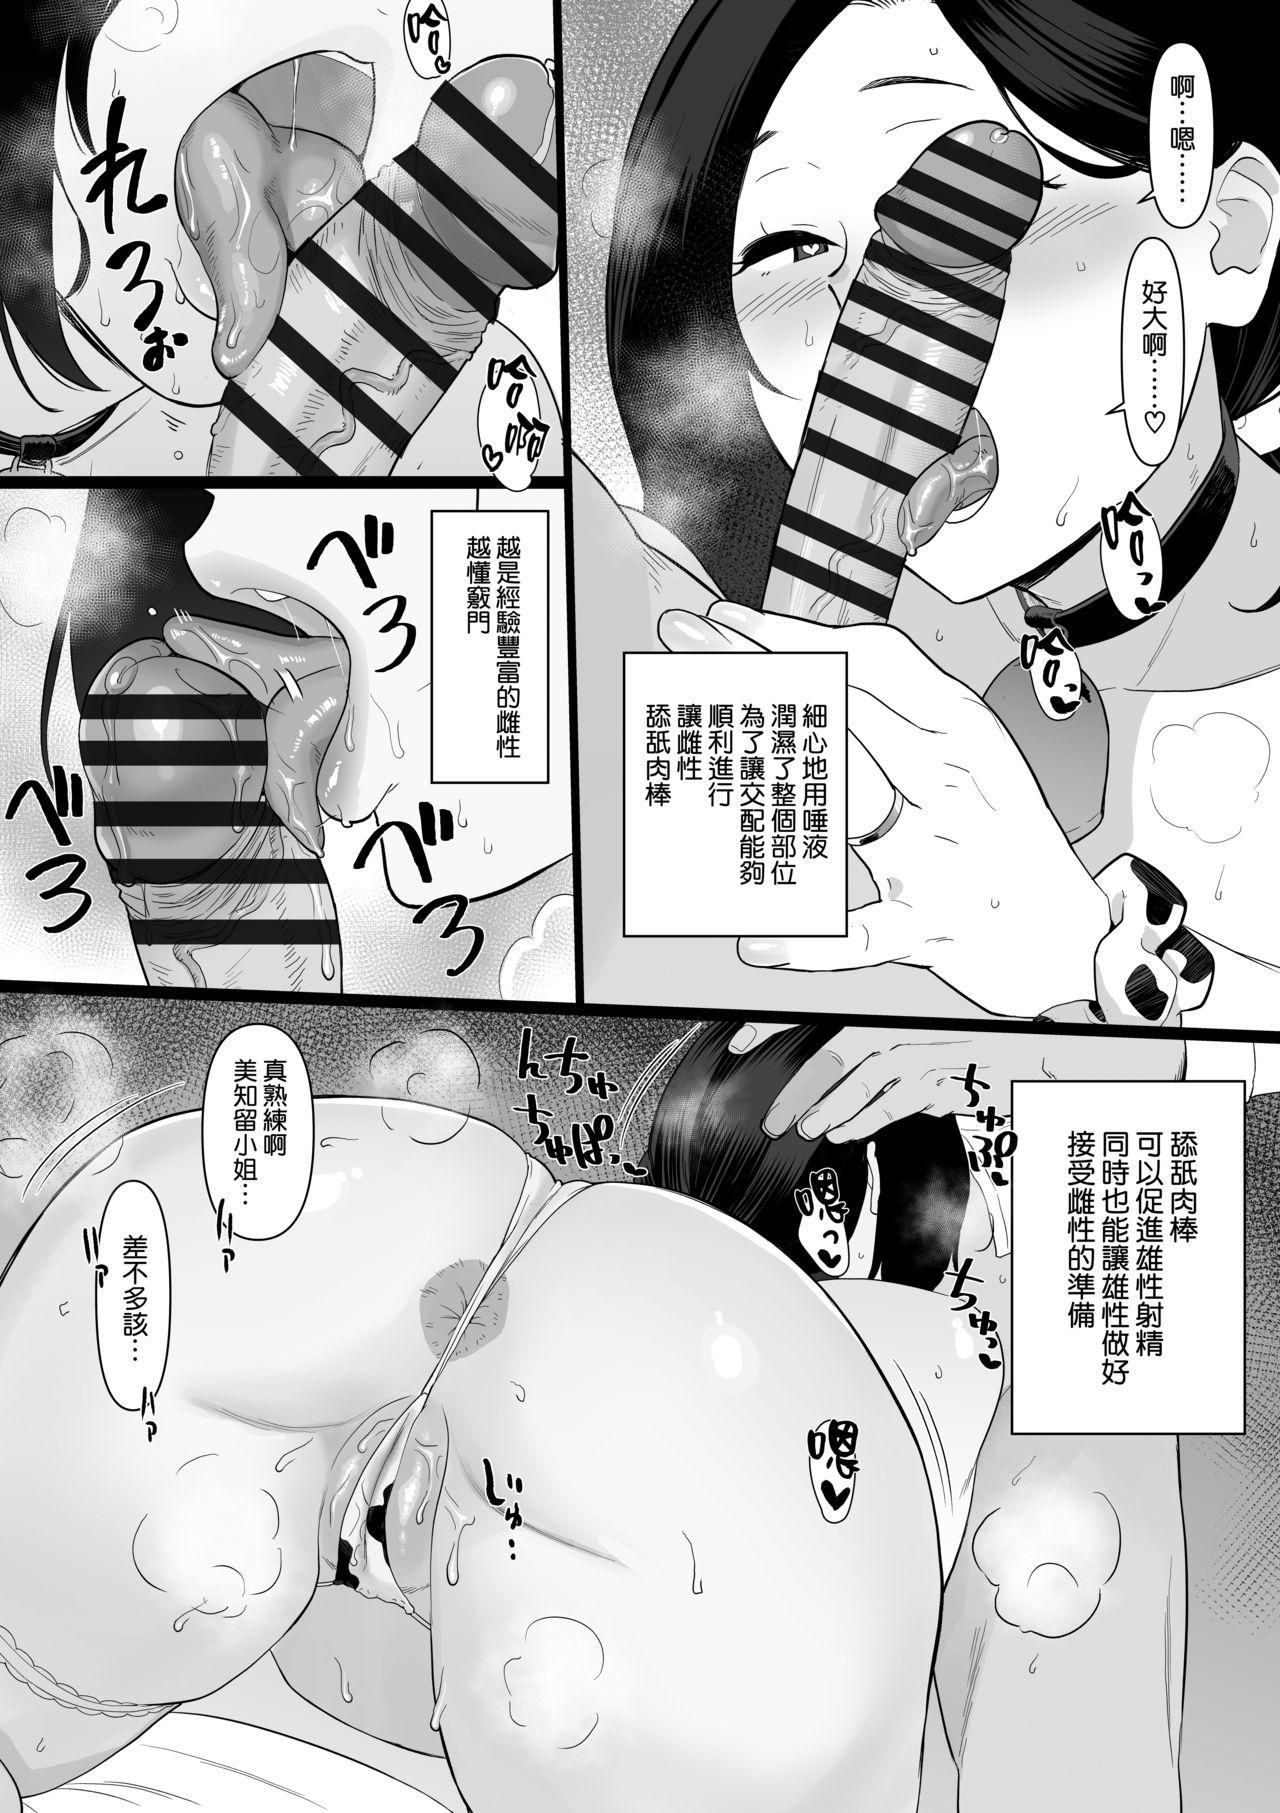 [Andoryu] Okaa-san Itadakimasu. Side Story 3 Ushi Manga Tanpenshuu Ch. 1-4 [Chinese] [空気系☆漢化] 8